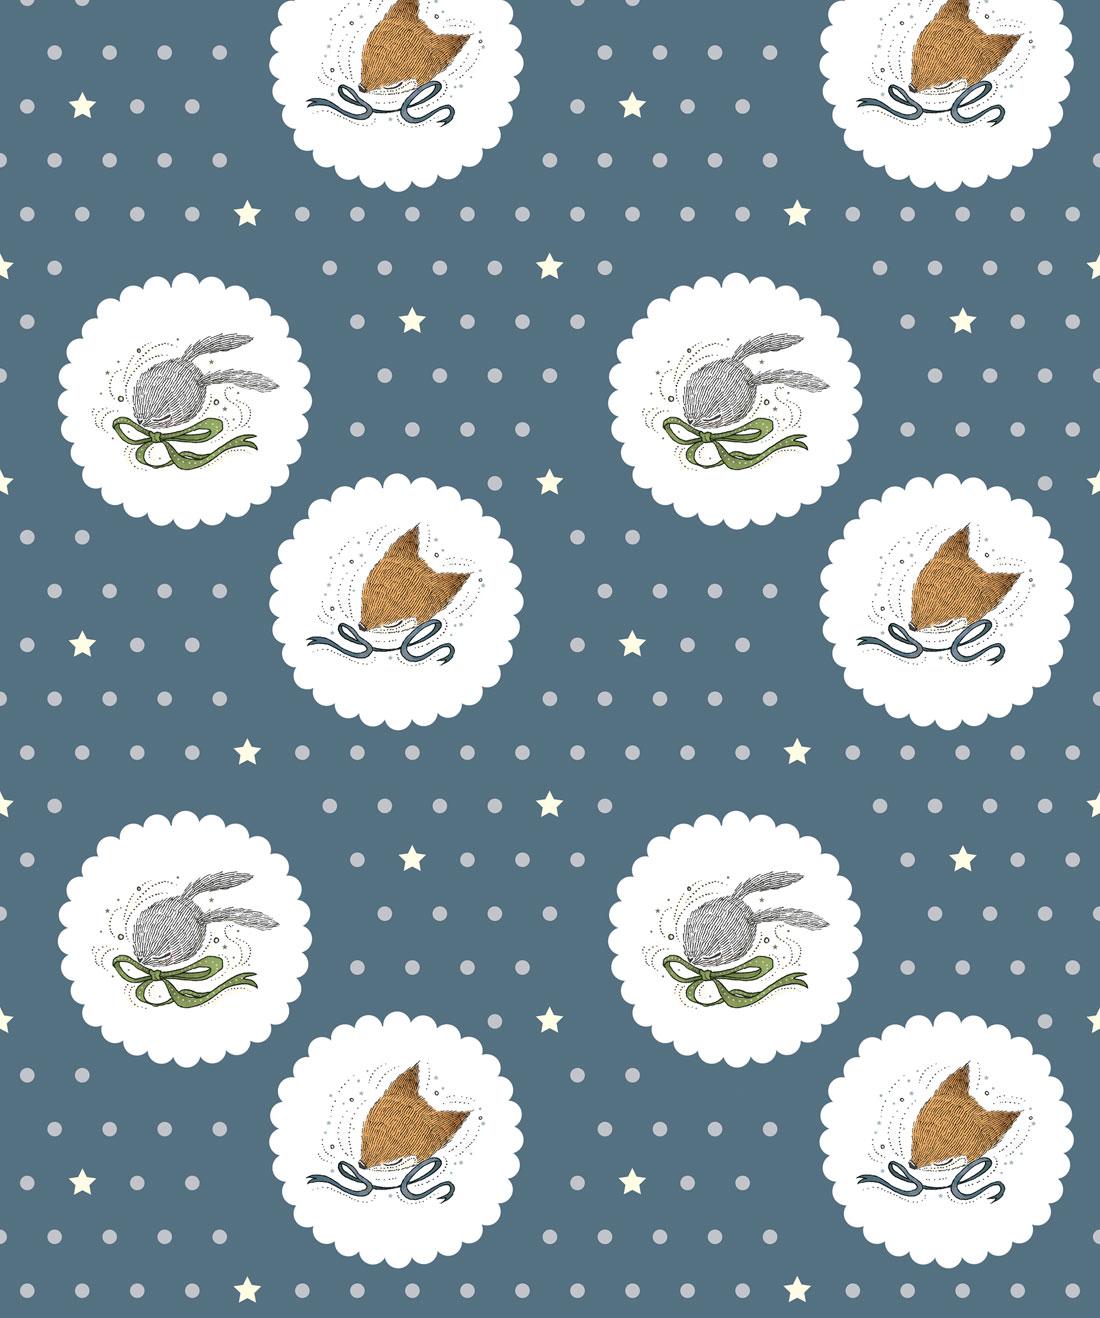 Fox & Rabbit Wallpaper